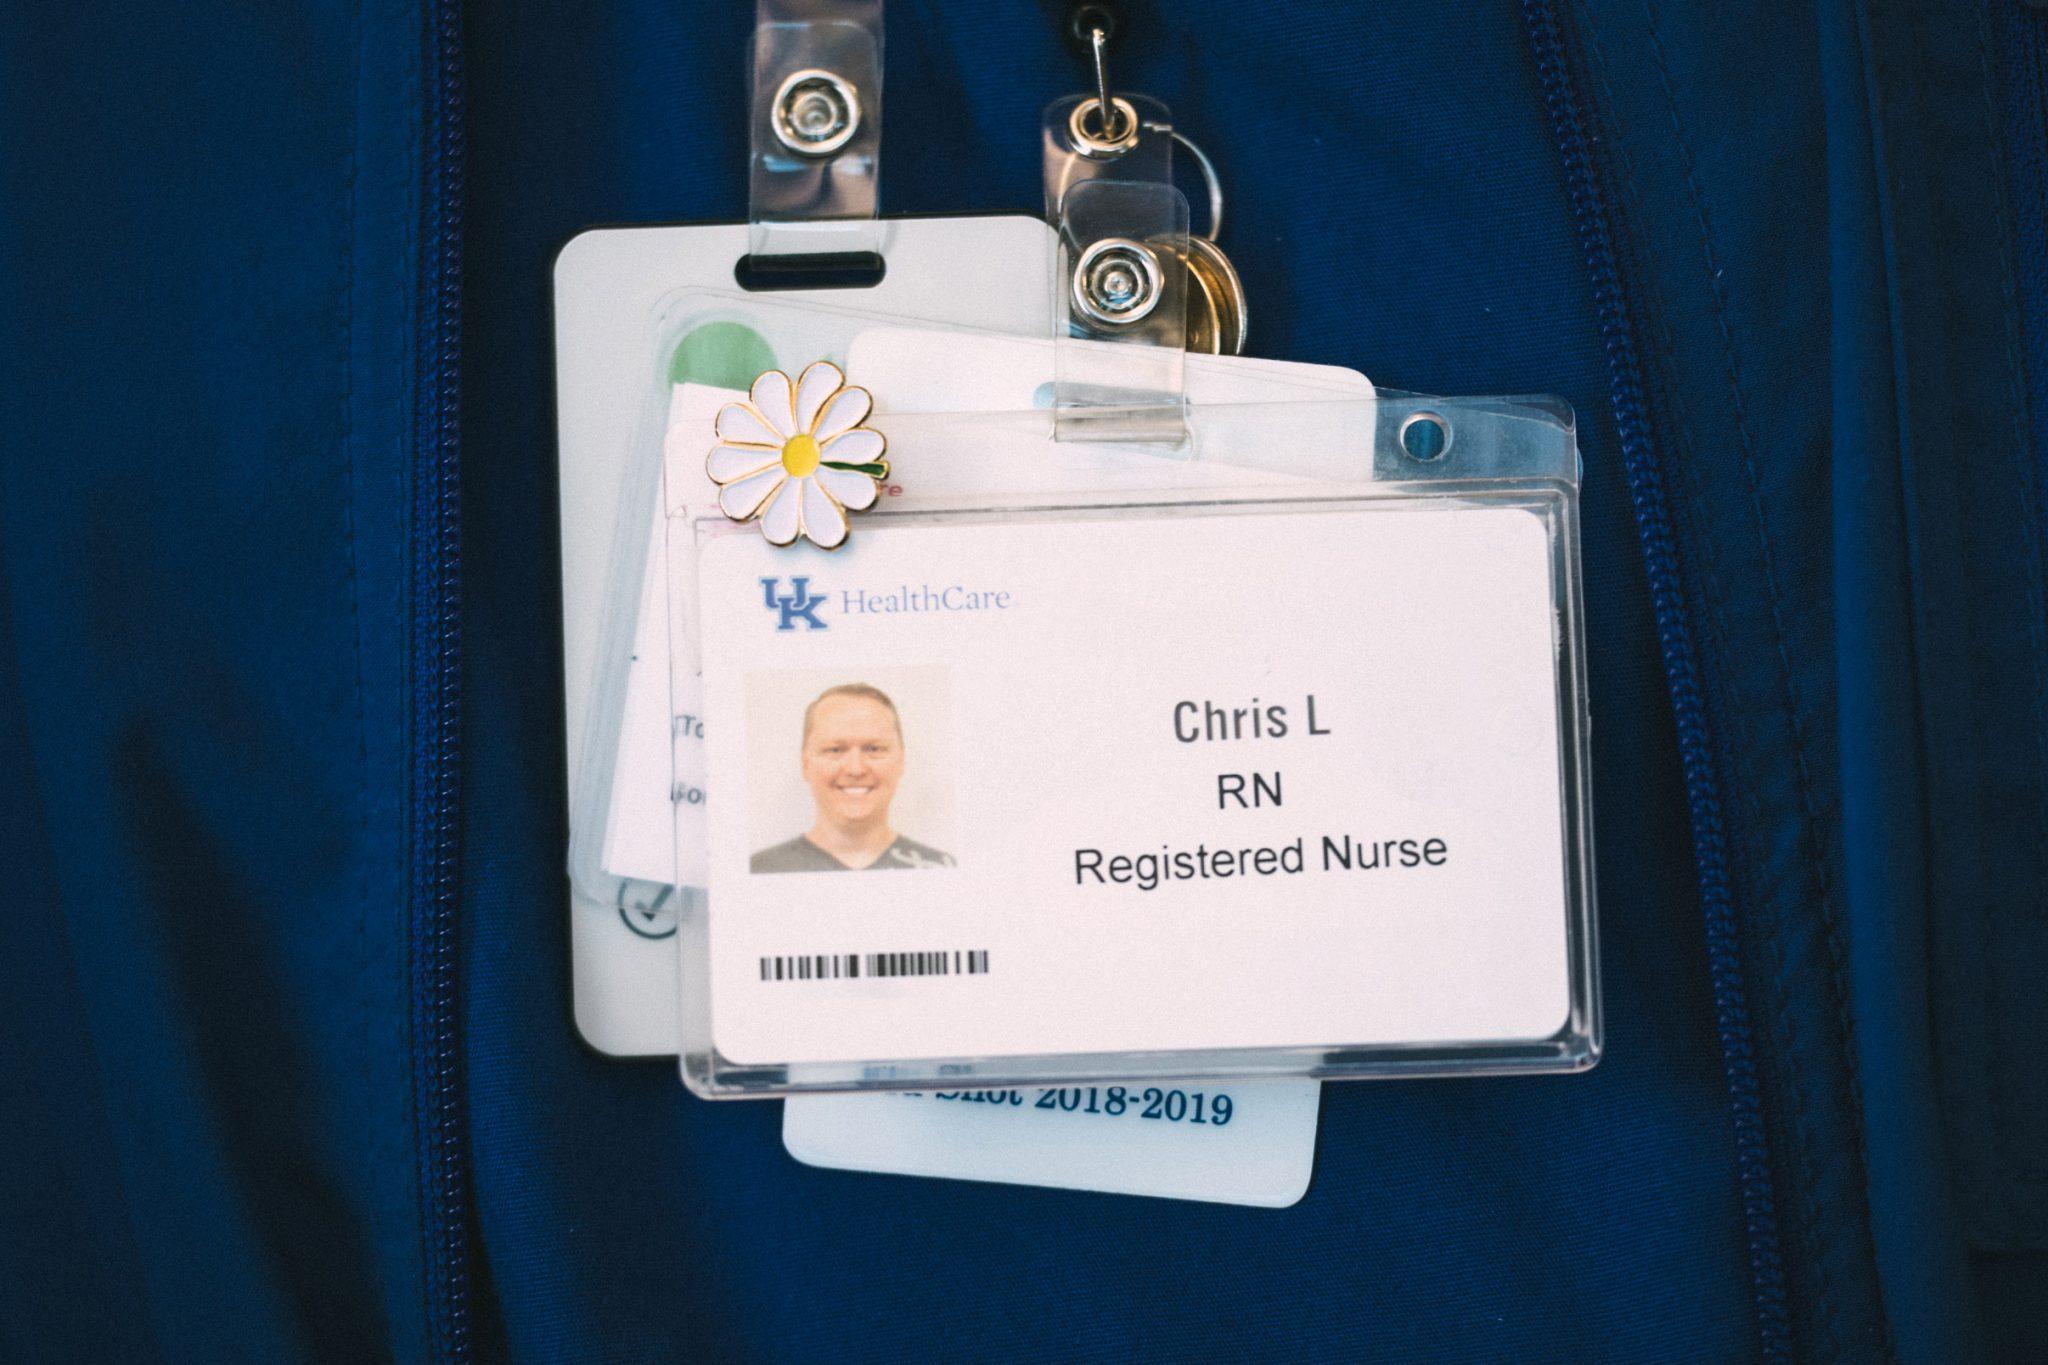 A close up of Chris's RN ID badges and DAISY award pin.